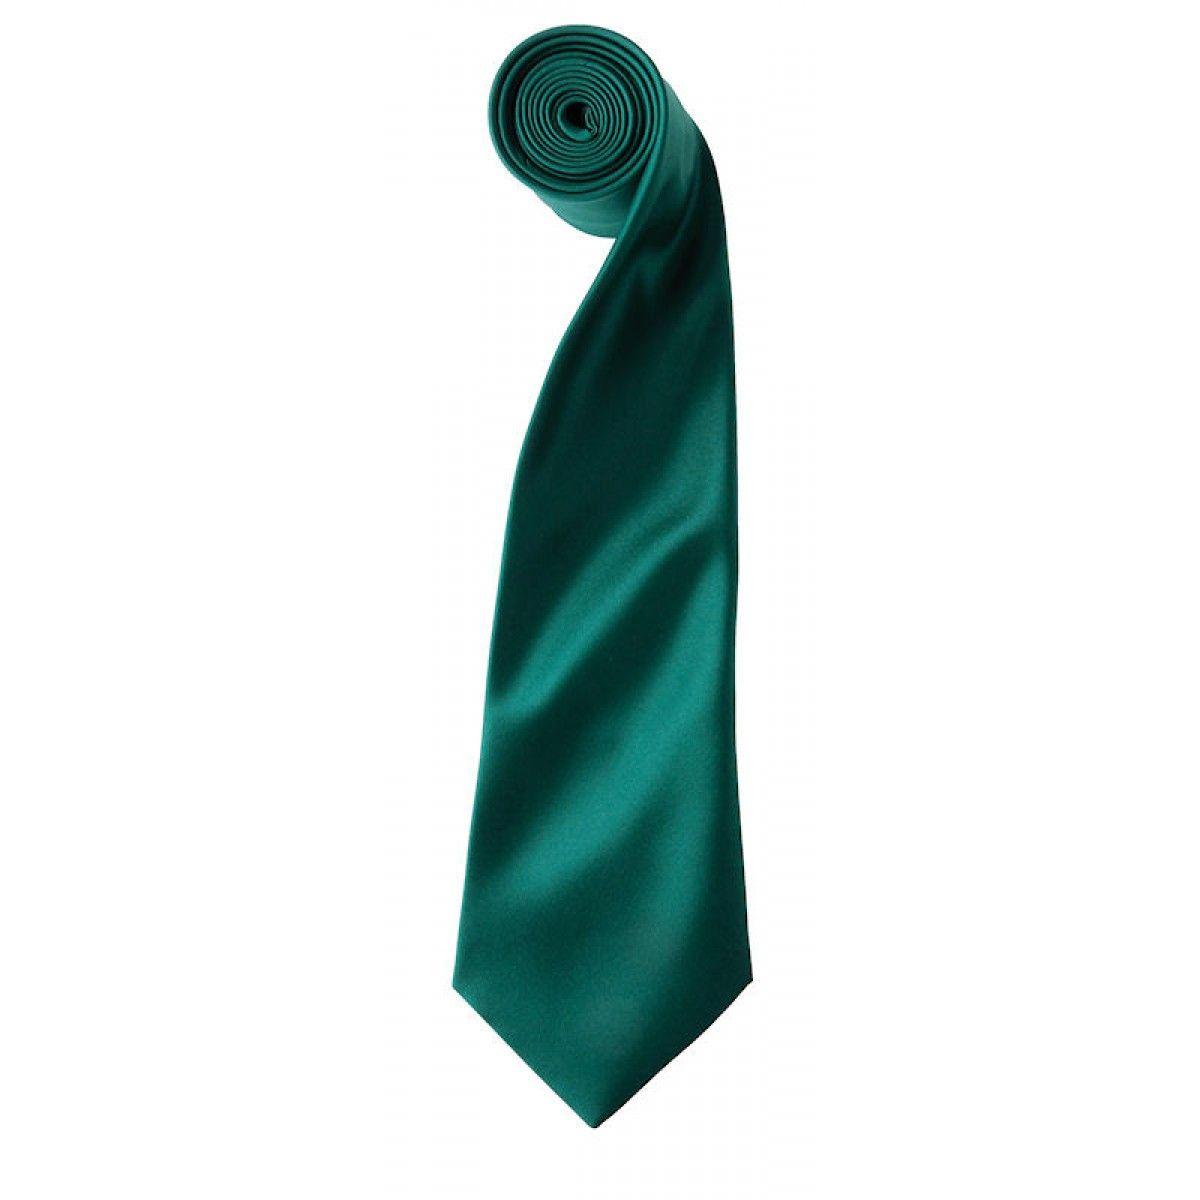 Satijnen stropdas donkergroen